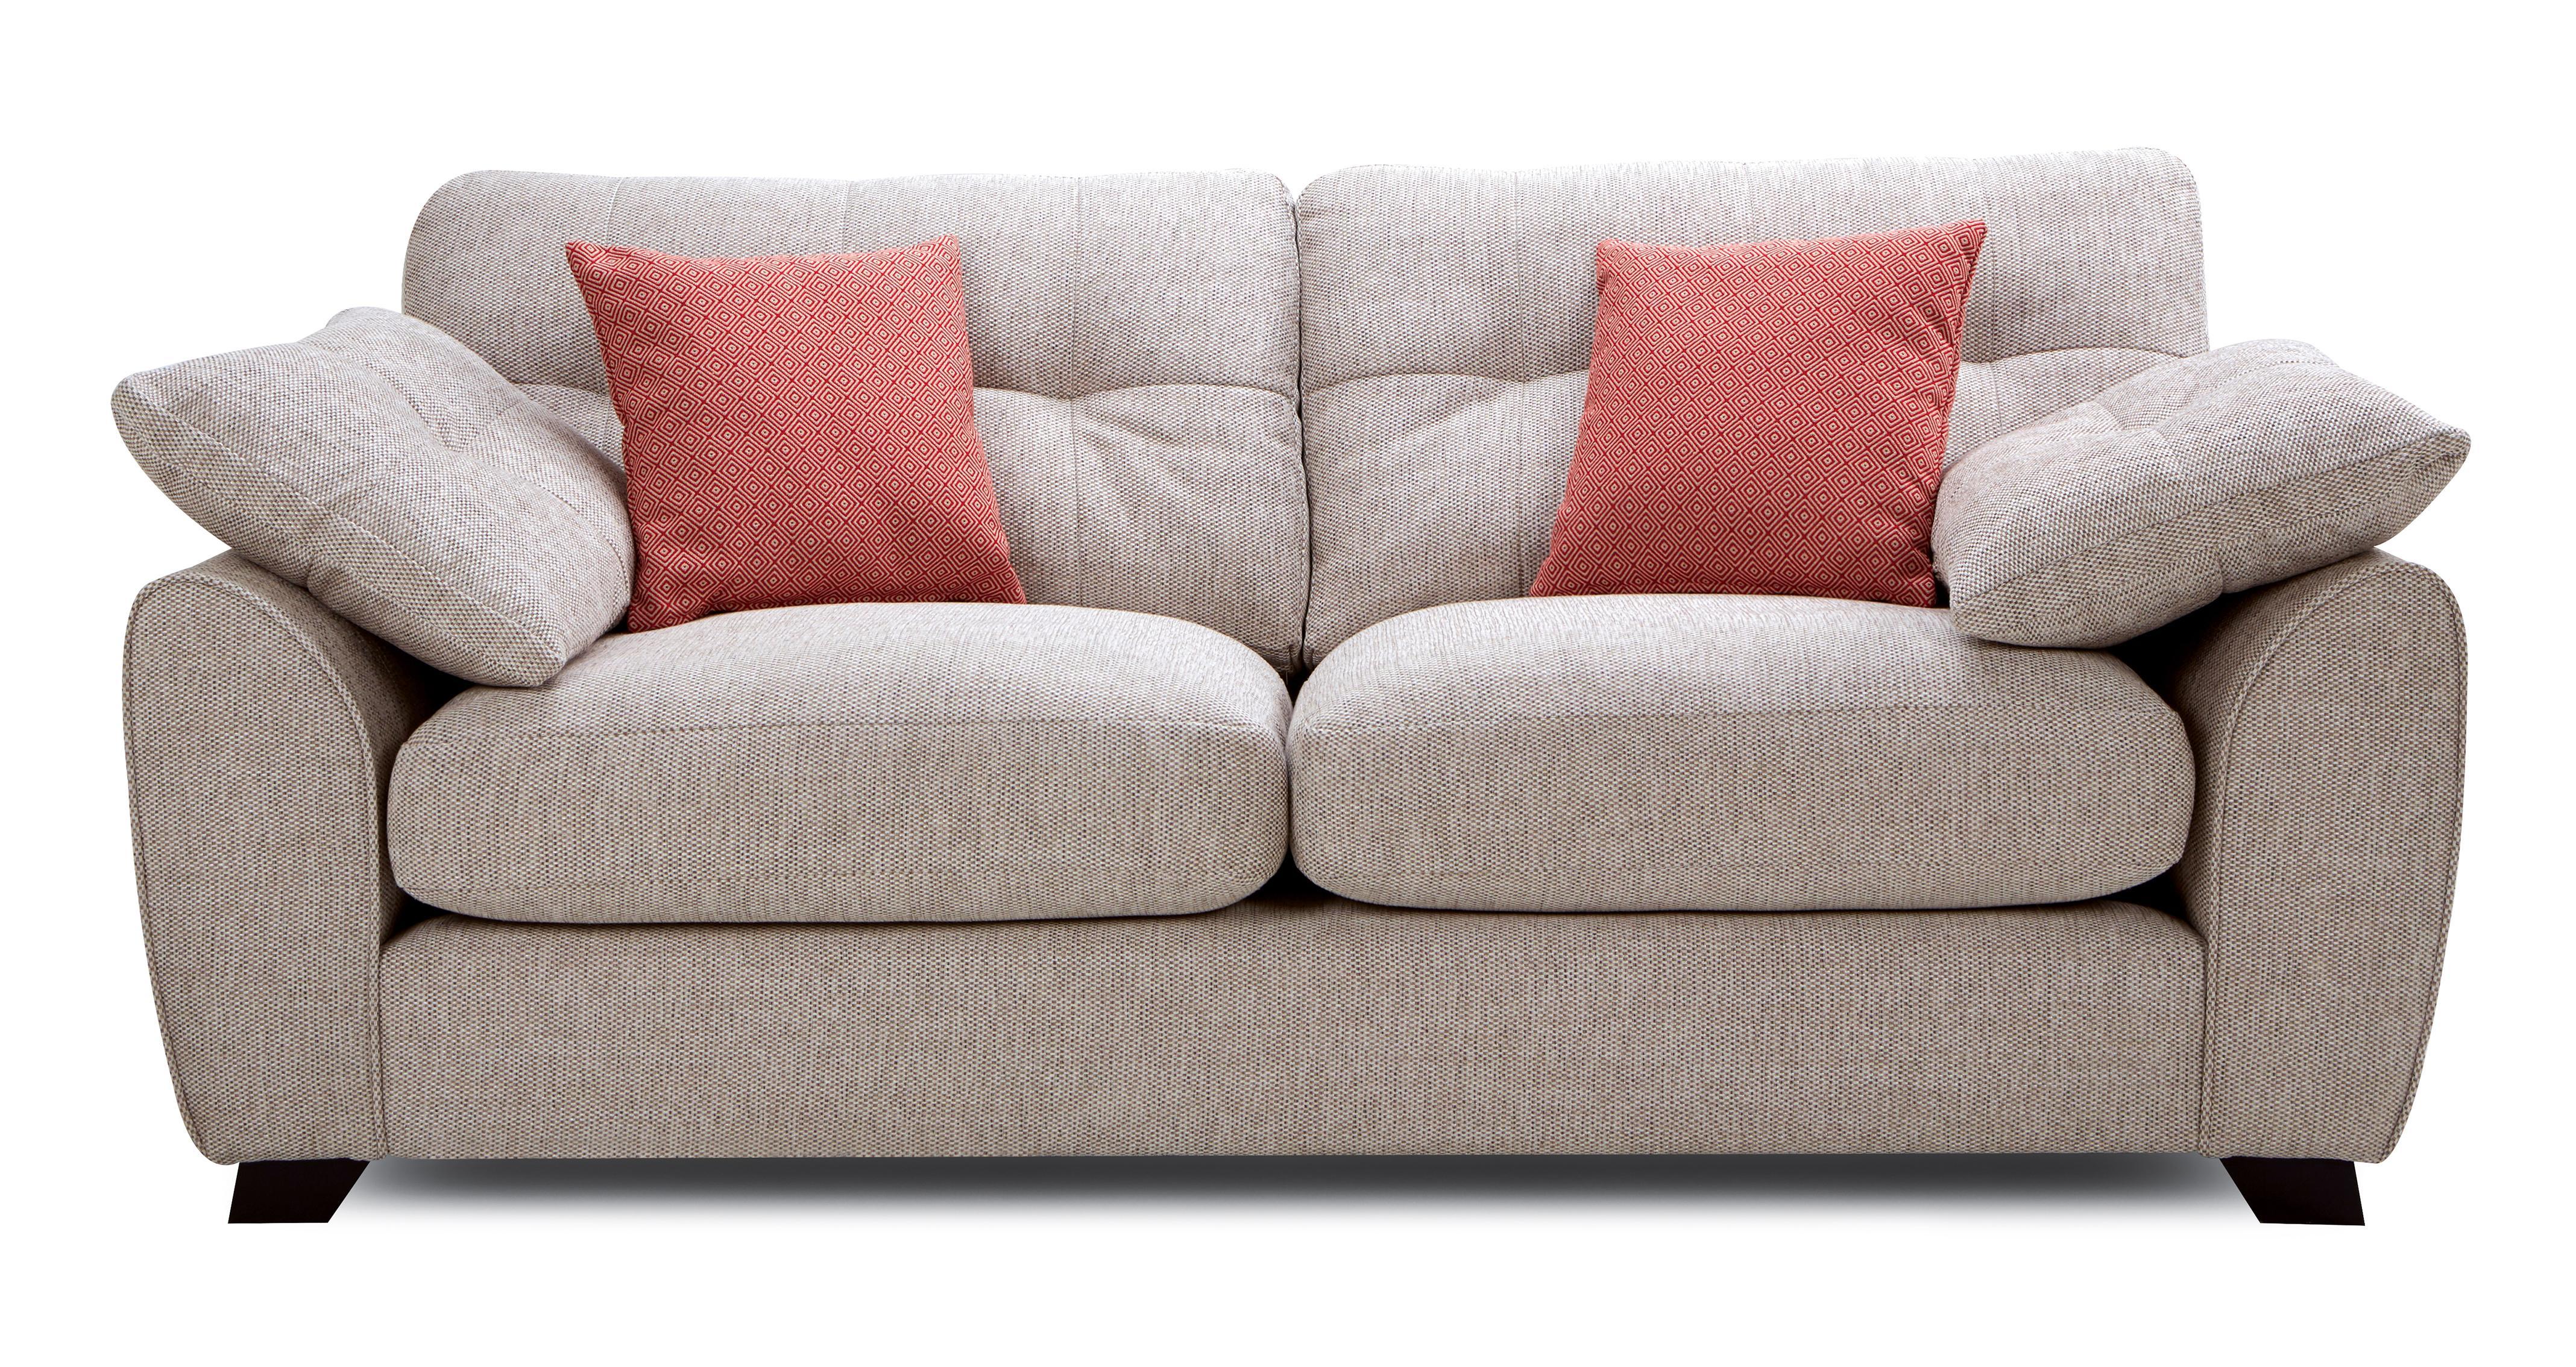 dfs sofas that come apart outdoor furniture sofa perth 3 seater kirkby microfinanceindia org